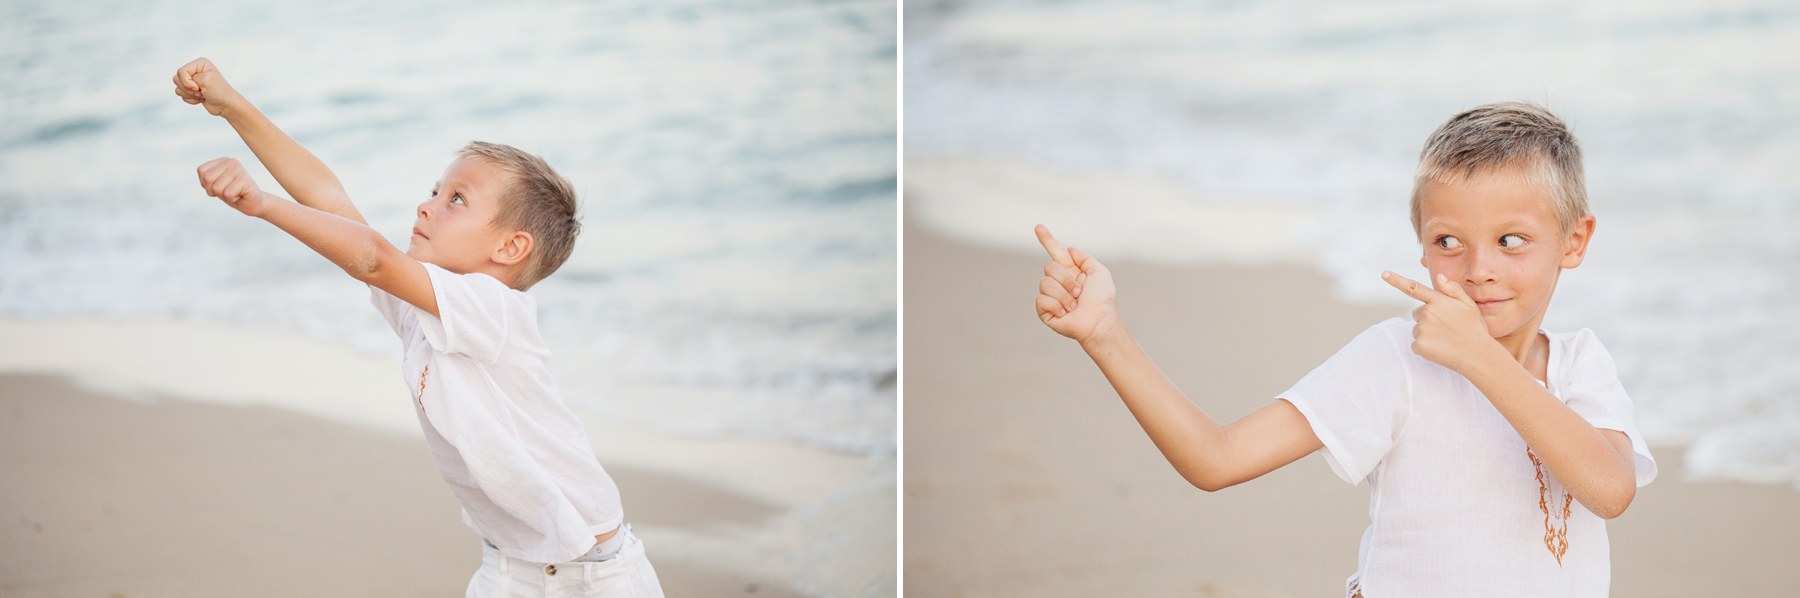 Candid children's beach photography